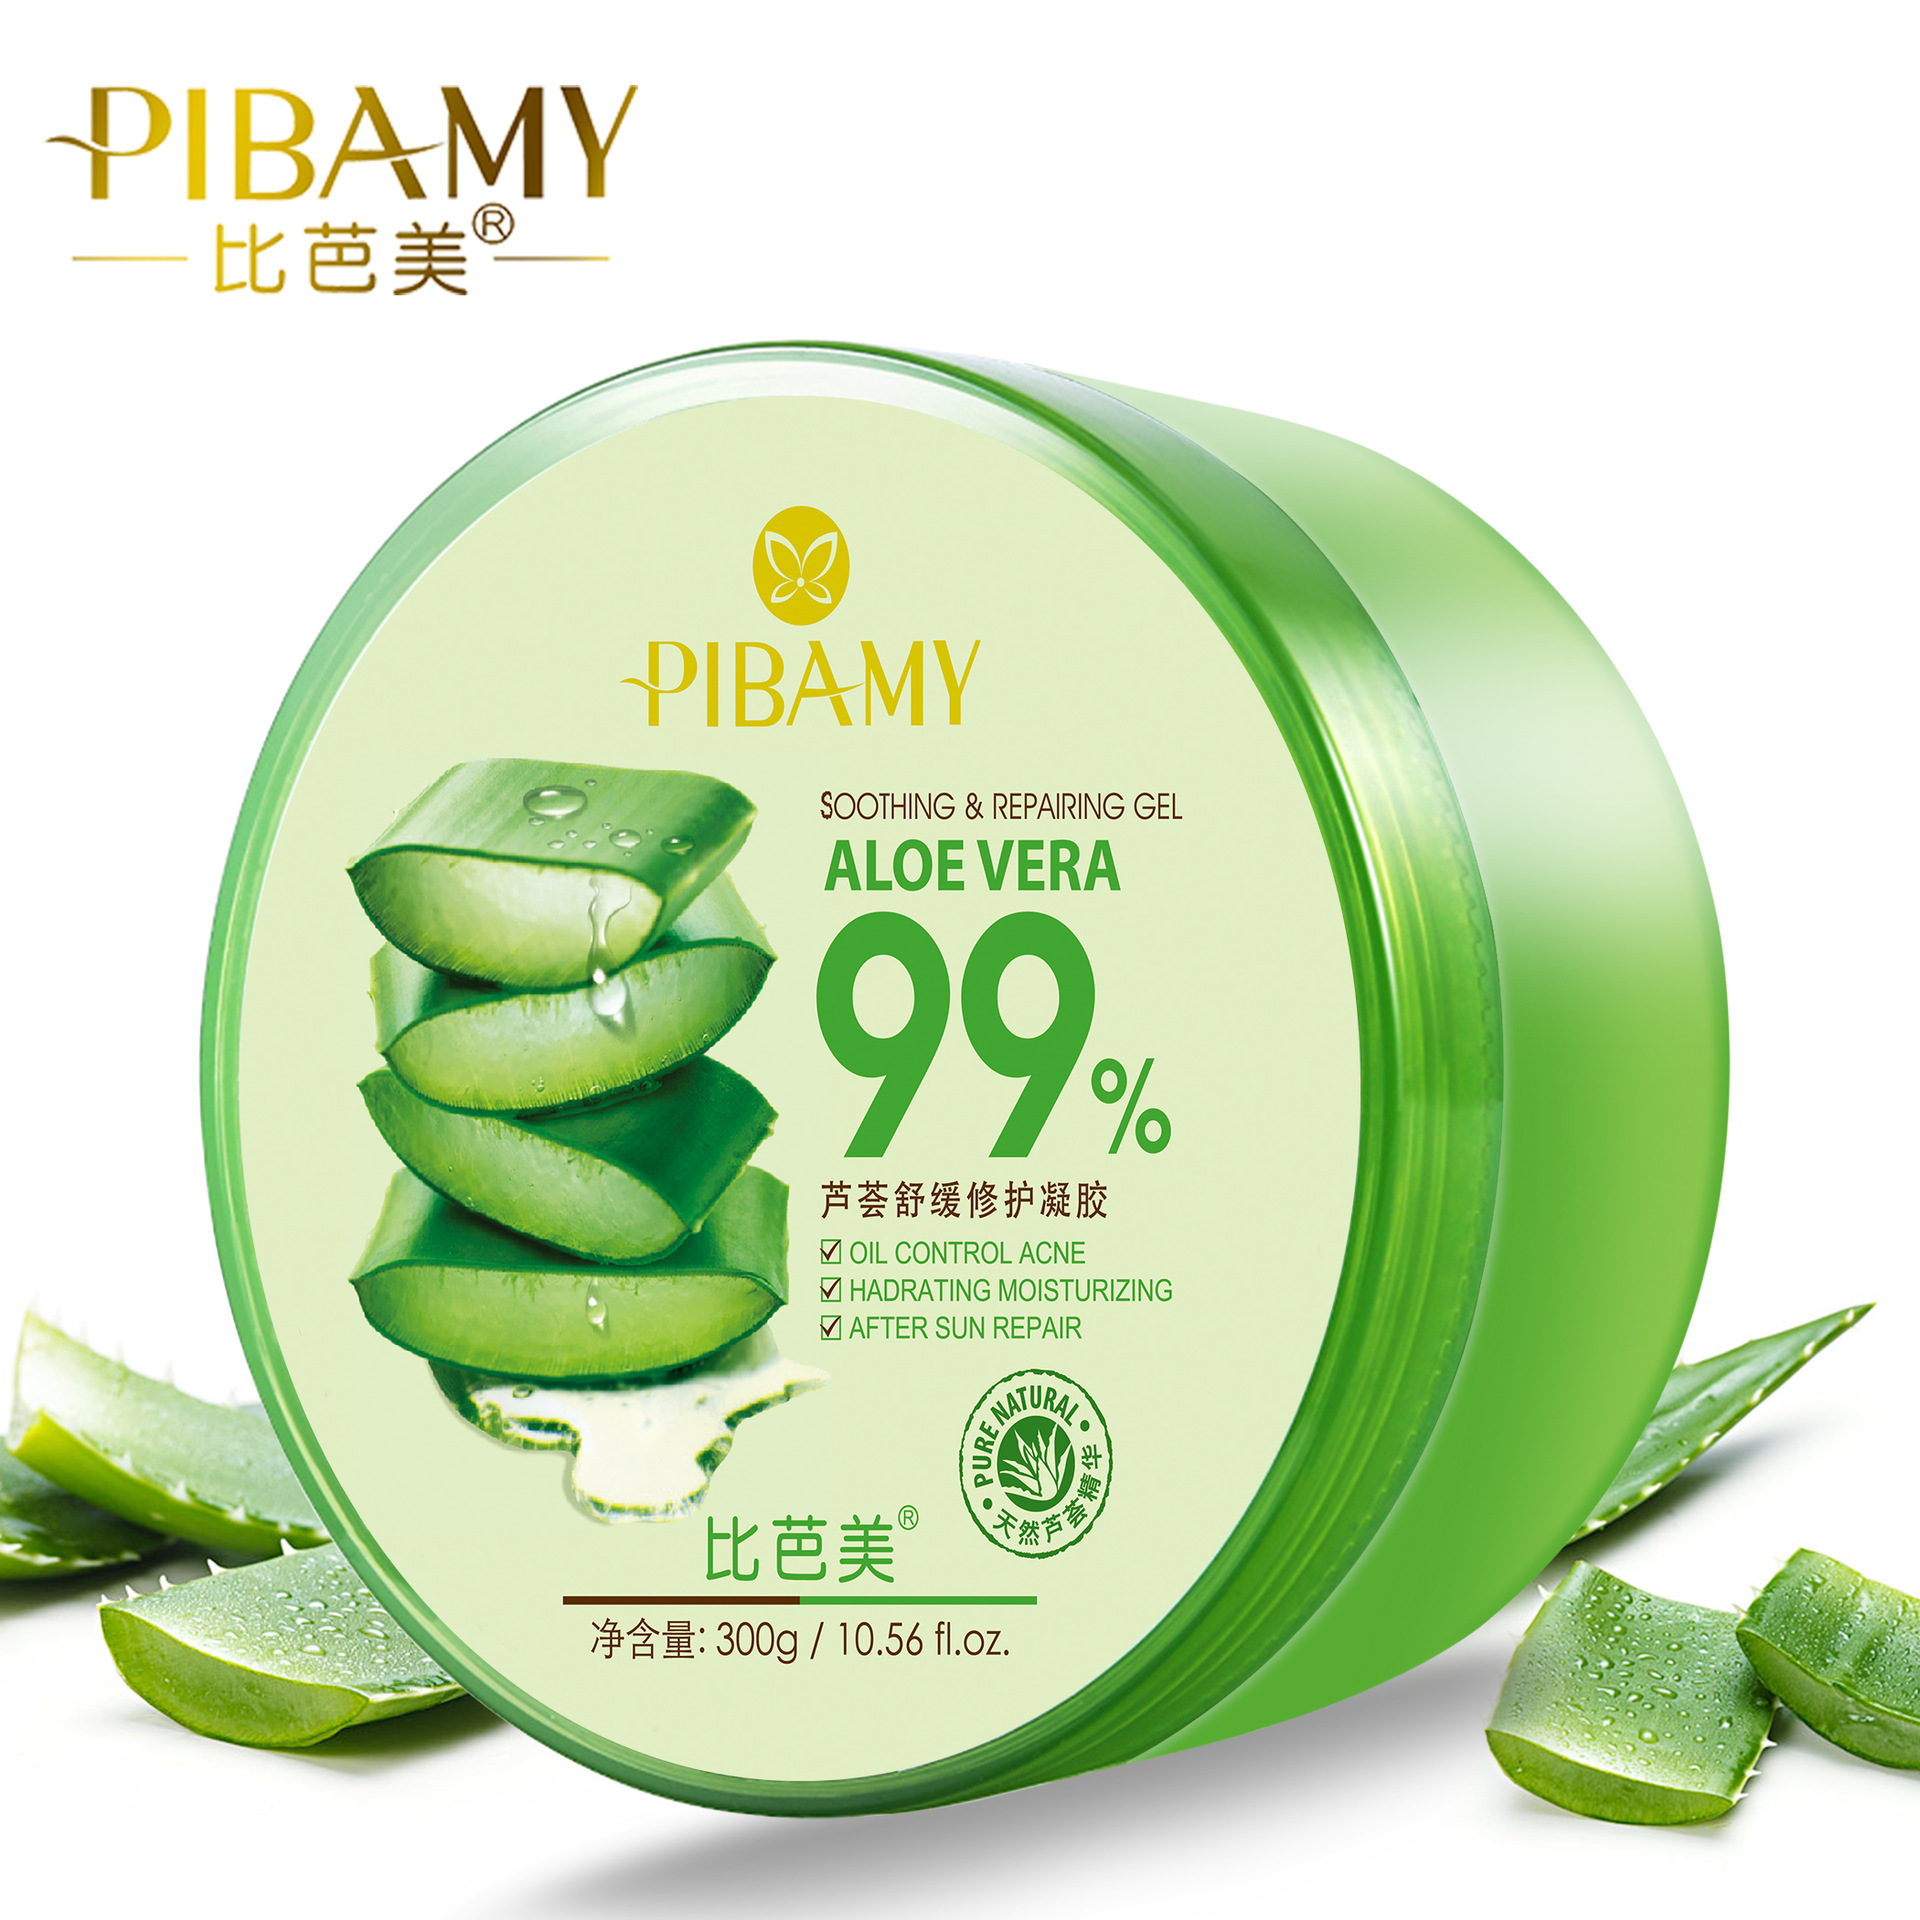 Bi Ba Mei Mủ nha đam Chai tròn chính hãng Aloe Vera 300ml